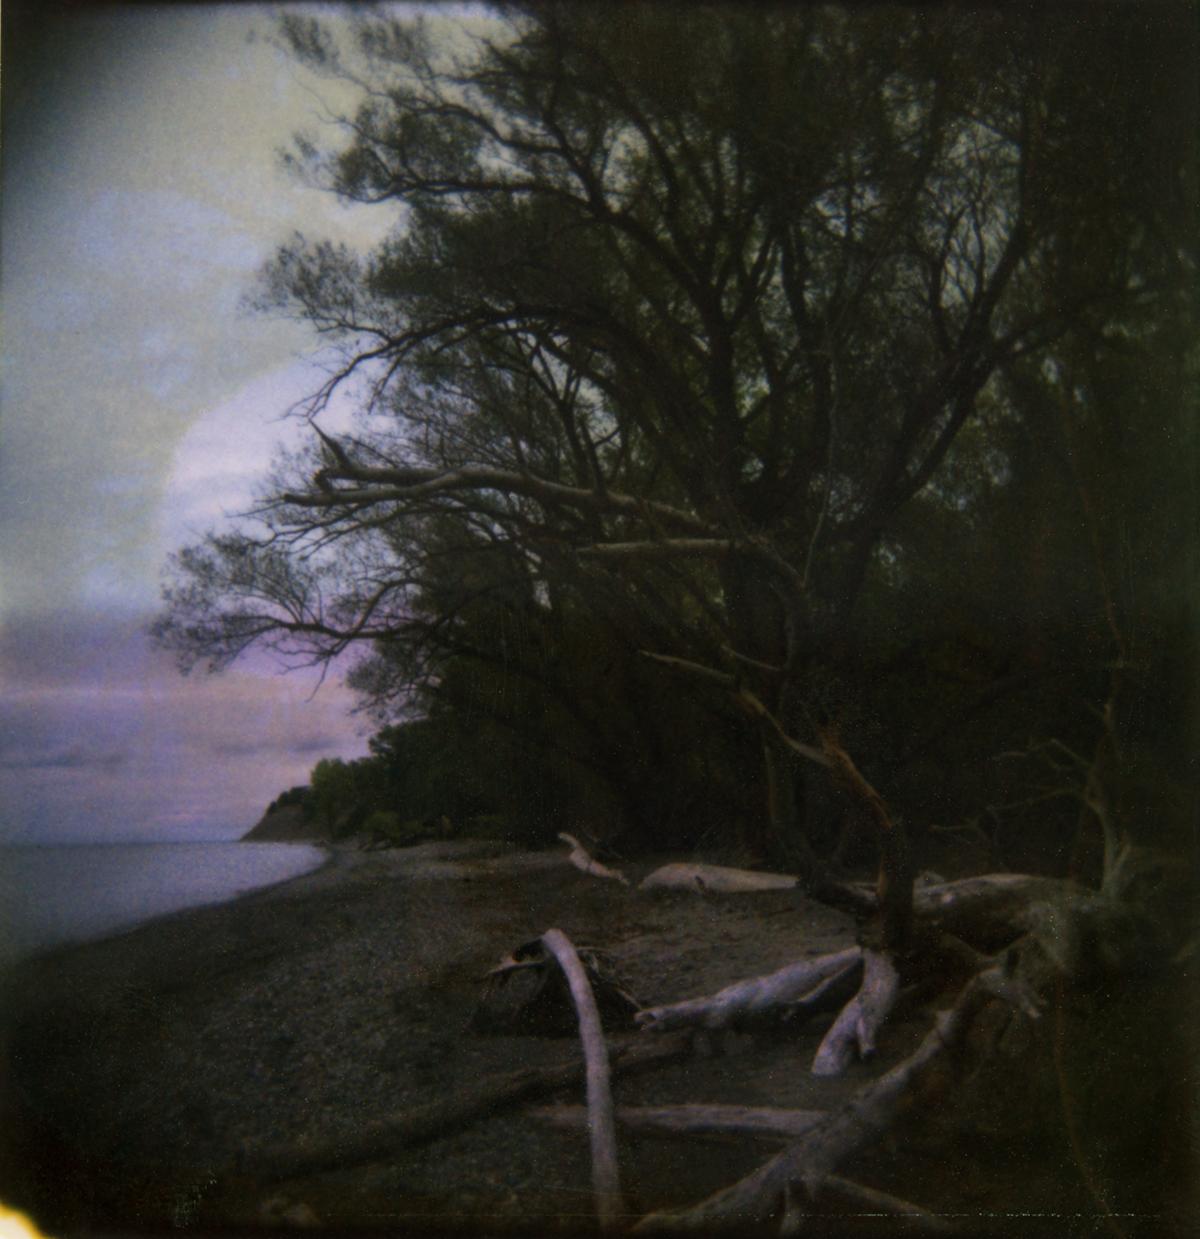 The Beach | Chimney Bluffs State Park, Wolcott NY